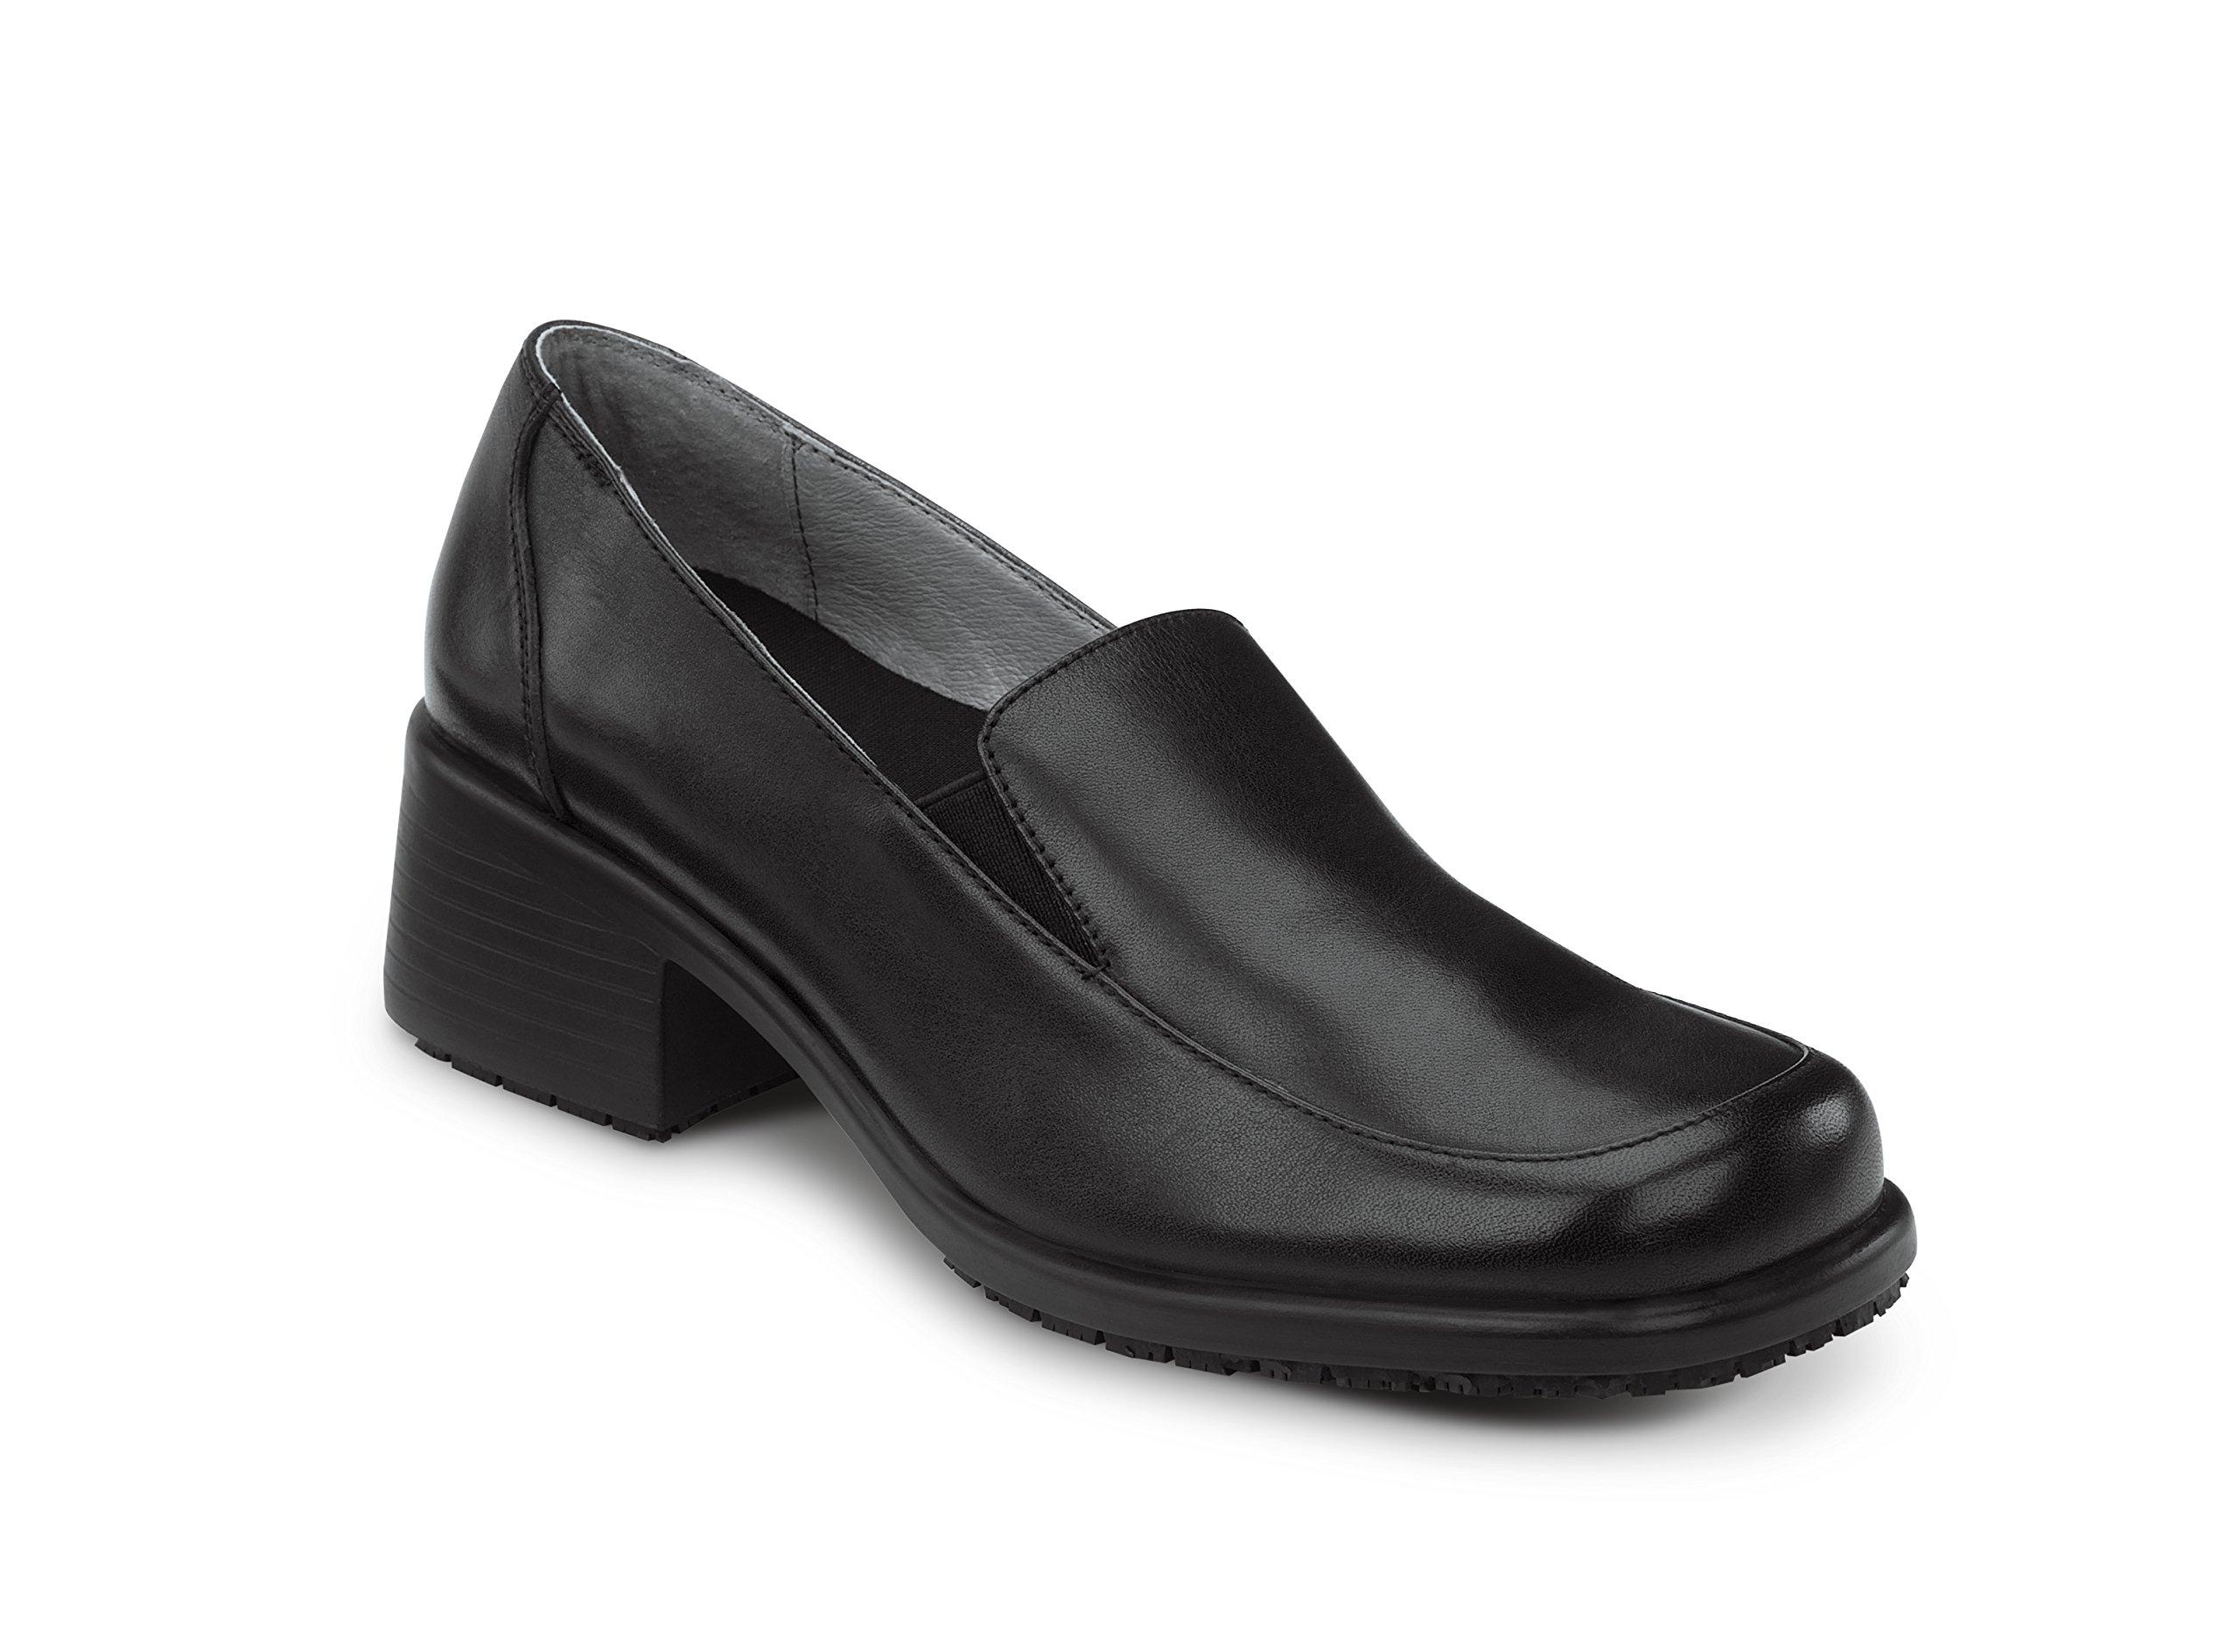 SR MAX Venice Women's Slip Resistant Dress Shoe